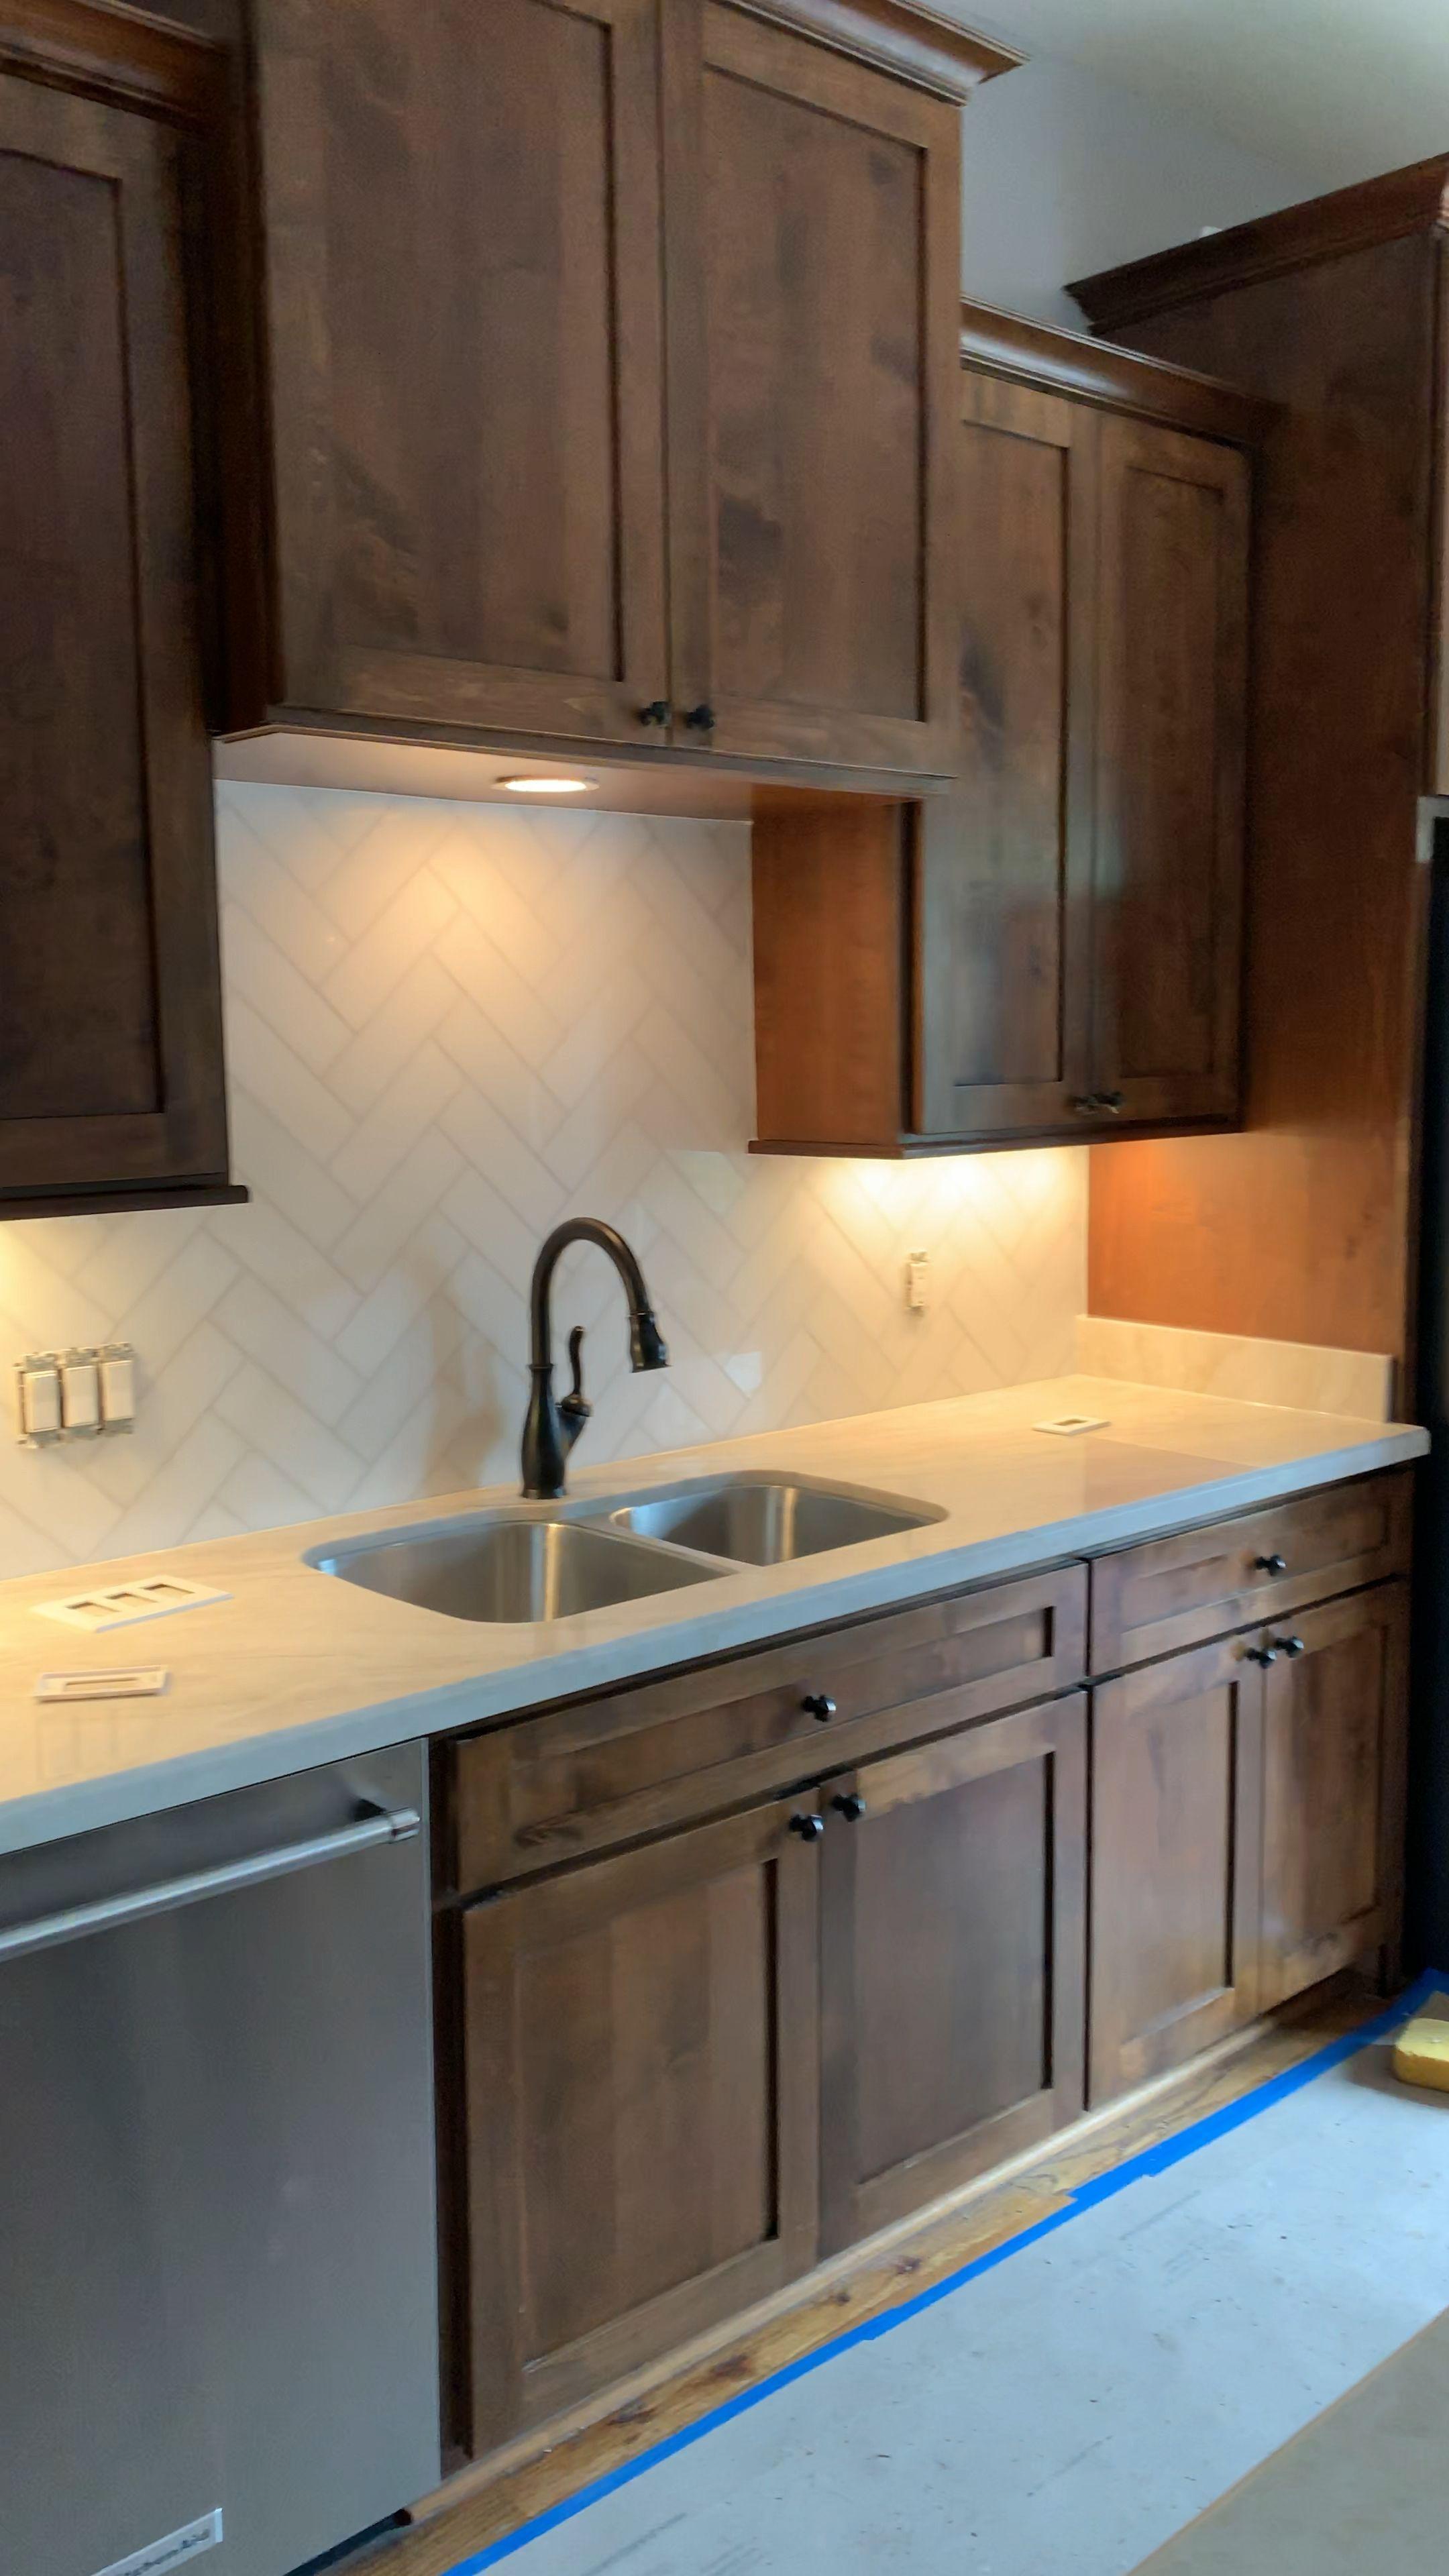 Home Decor Items Herringbone Kitchendesign Backsplash Whitemarble Kitchenideas In 2020 Rustic Kitchen Backsplash Rustic Kitchen Rustic Farmhouse Kitchen